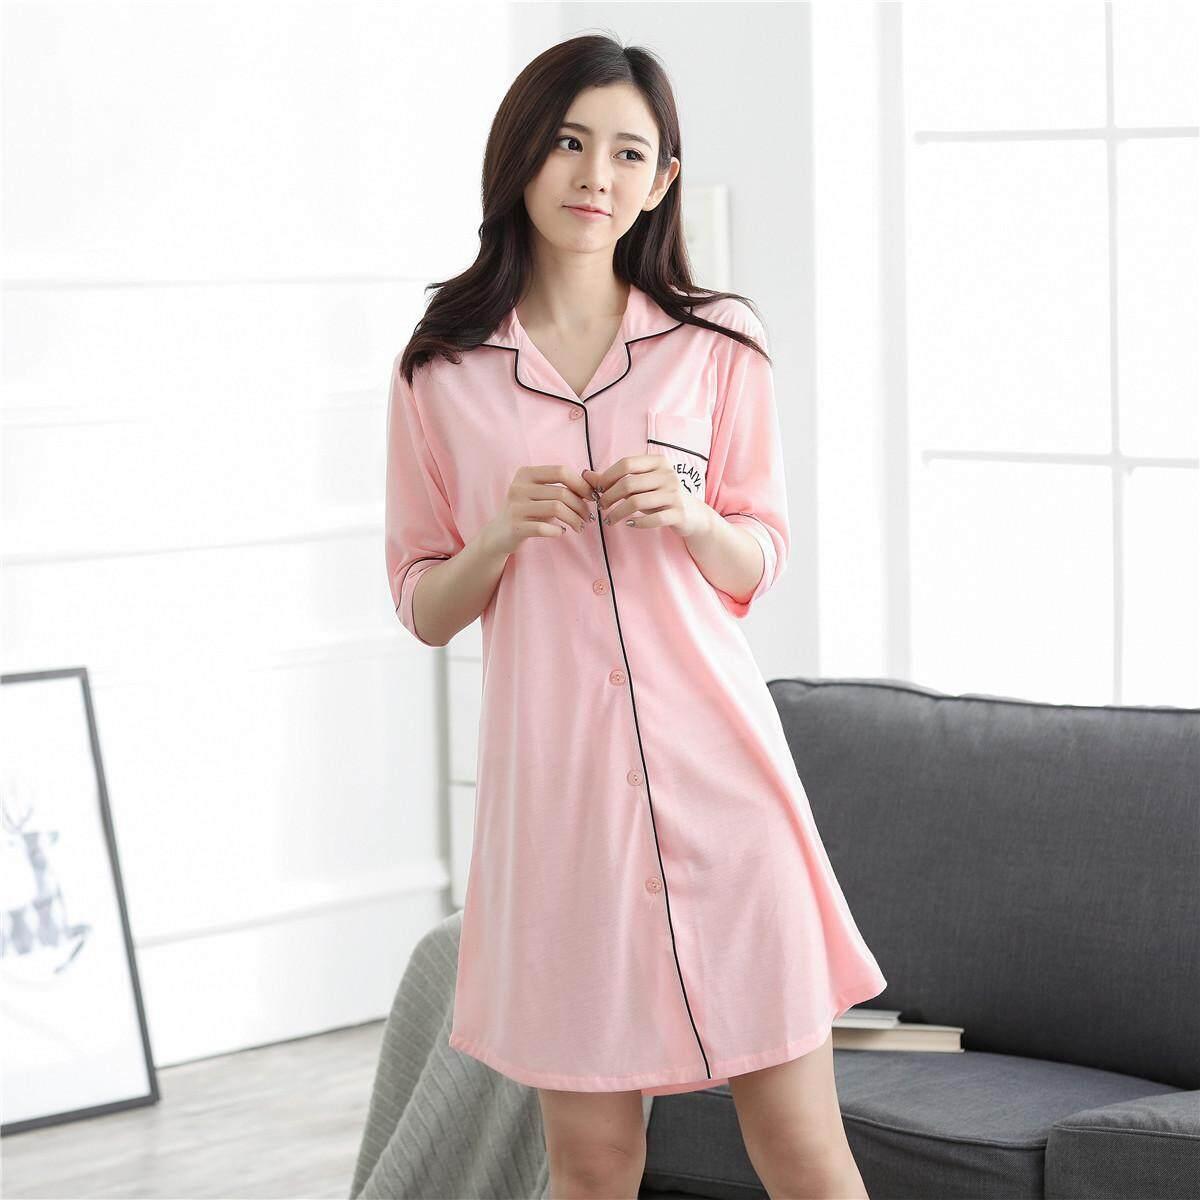 247a990253 New Summer Nightwear Shirt Home Dress Short Sleeved Fabric Short Skirt  Female Korean Version Knitted LA11LAWYL143